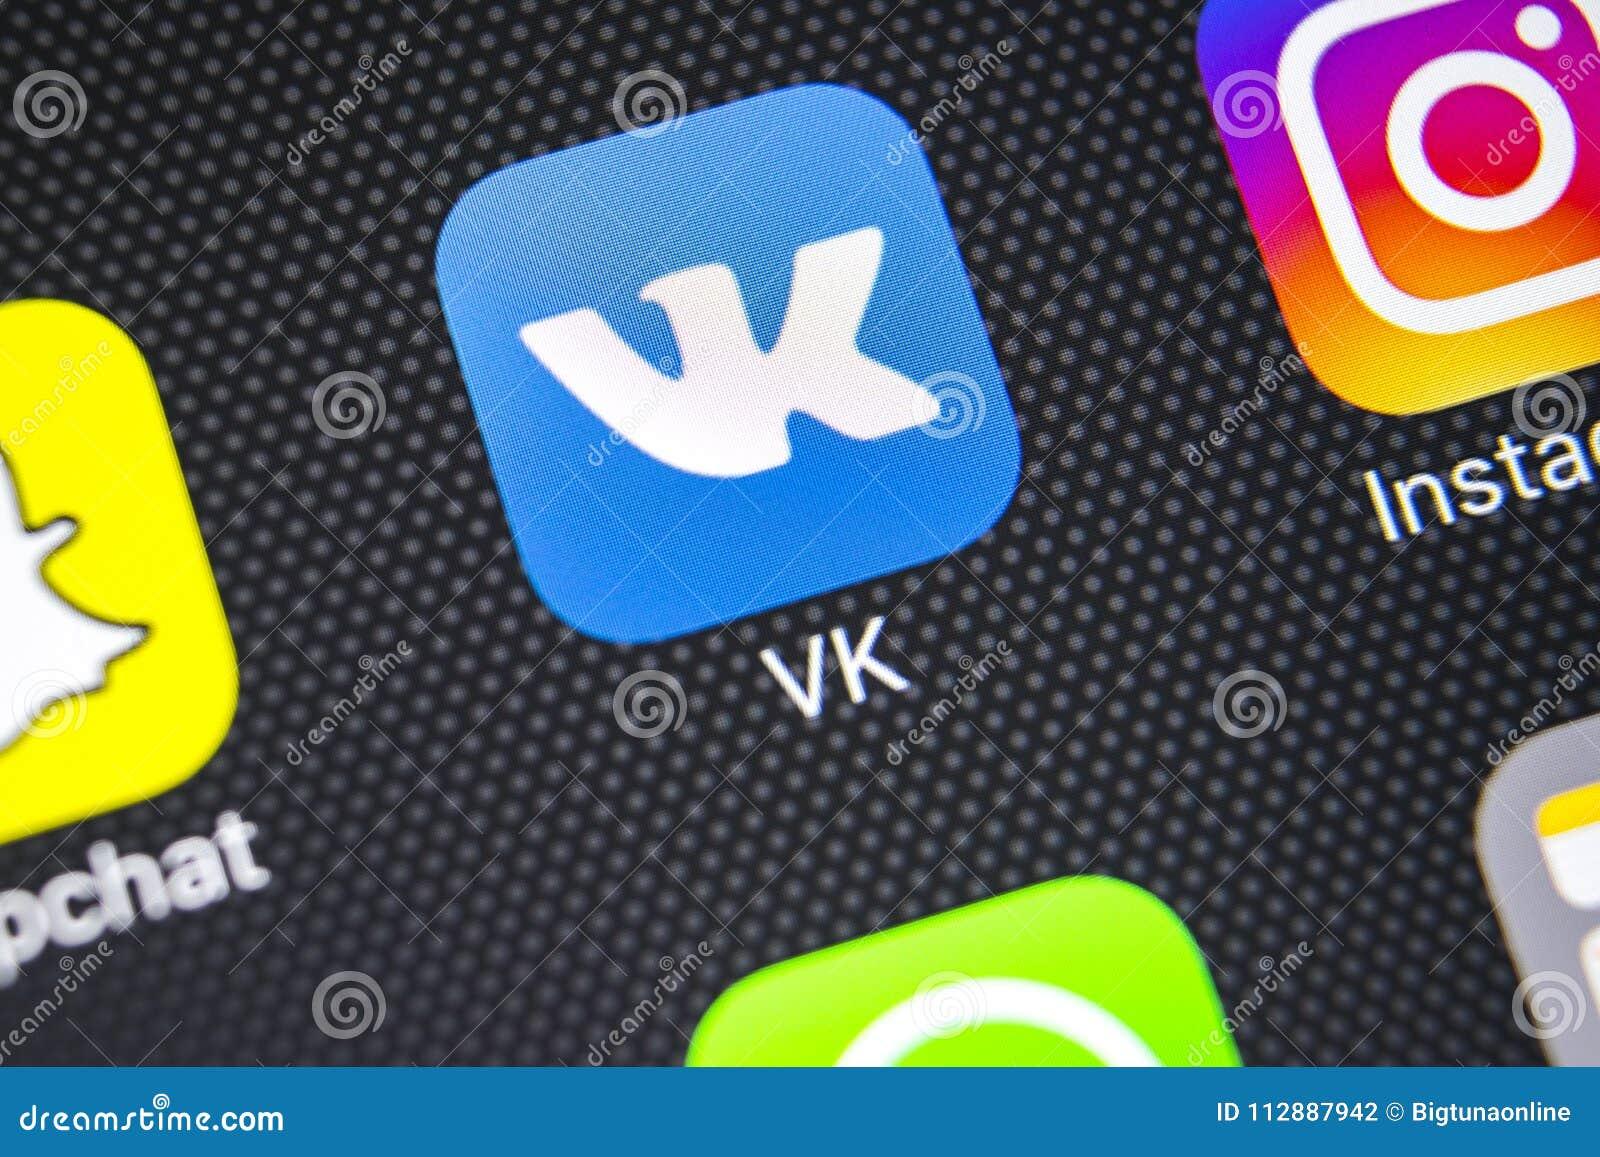 vk apple id